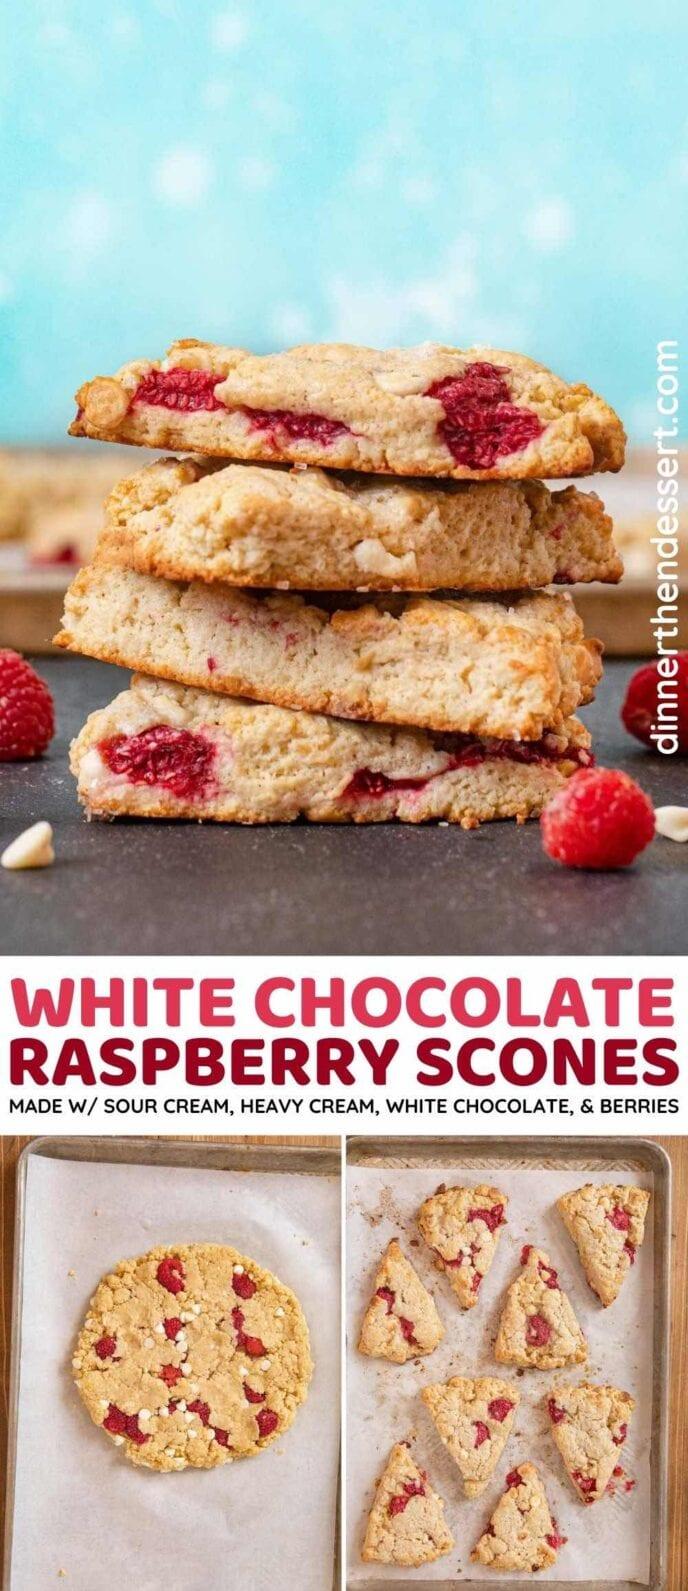 White Chocolate Raspberry Scones collage